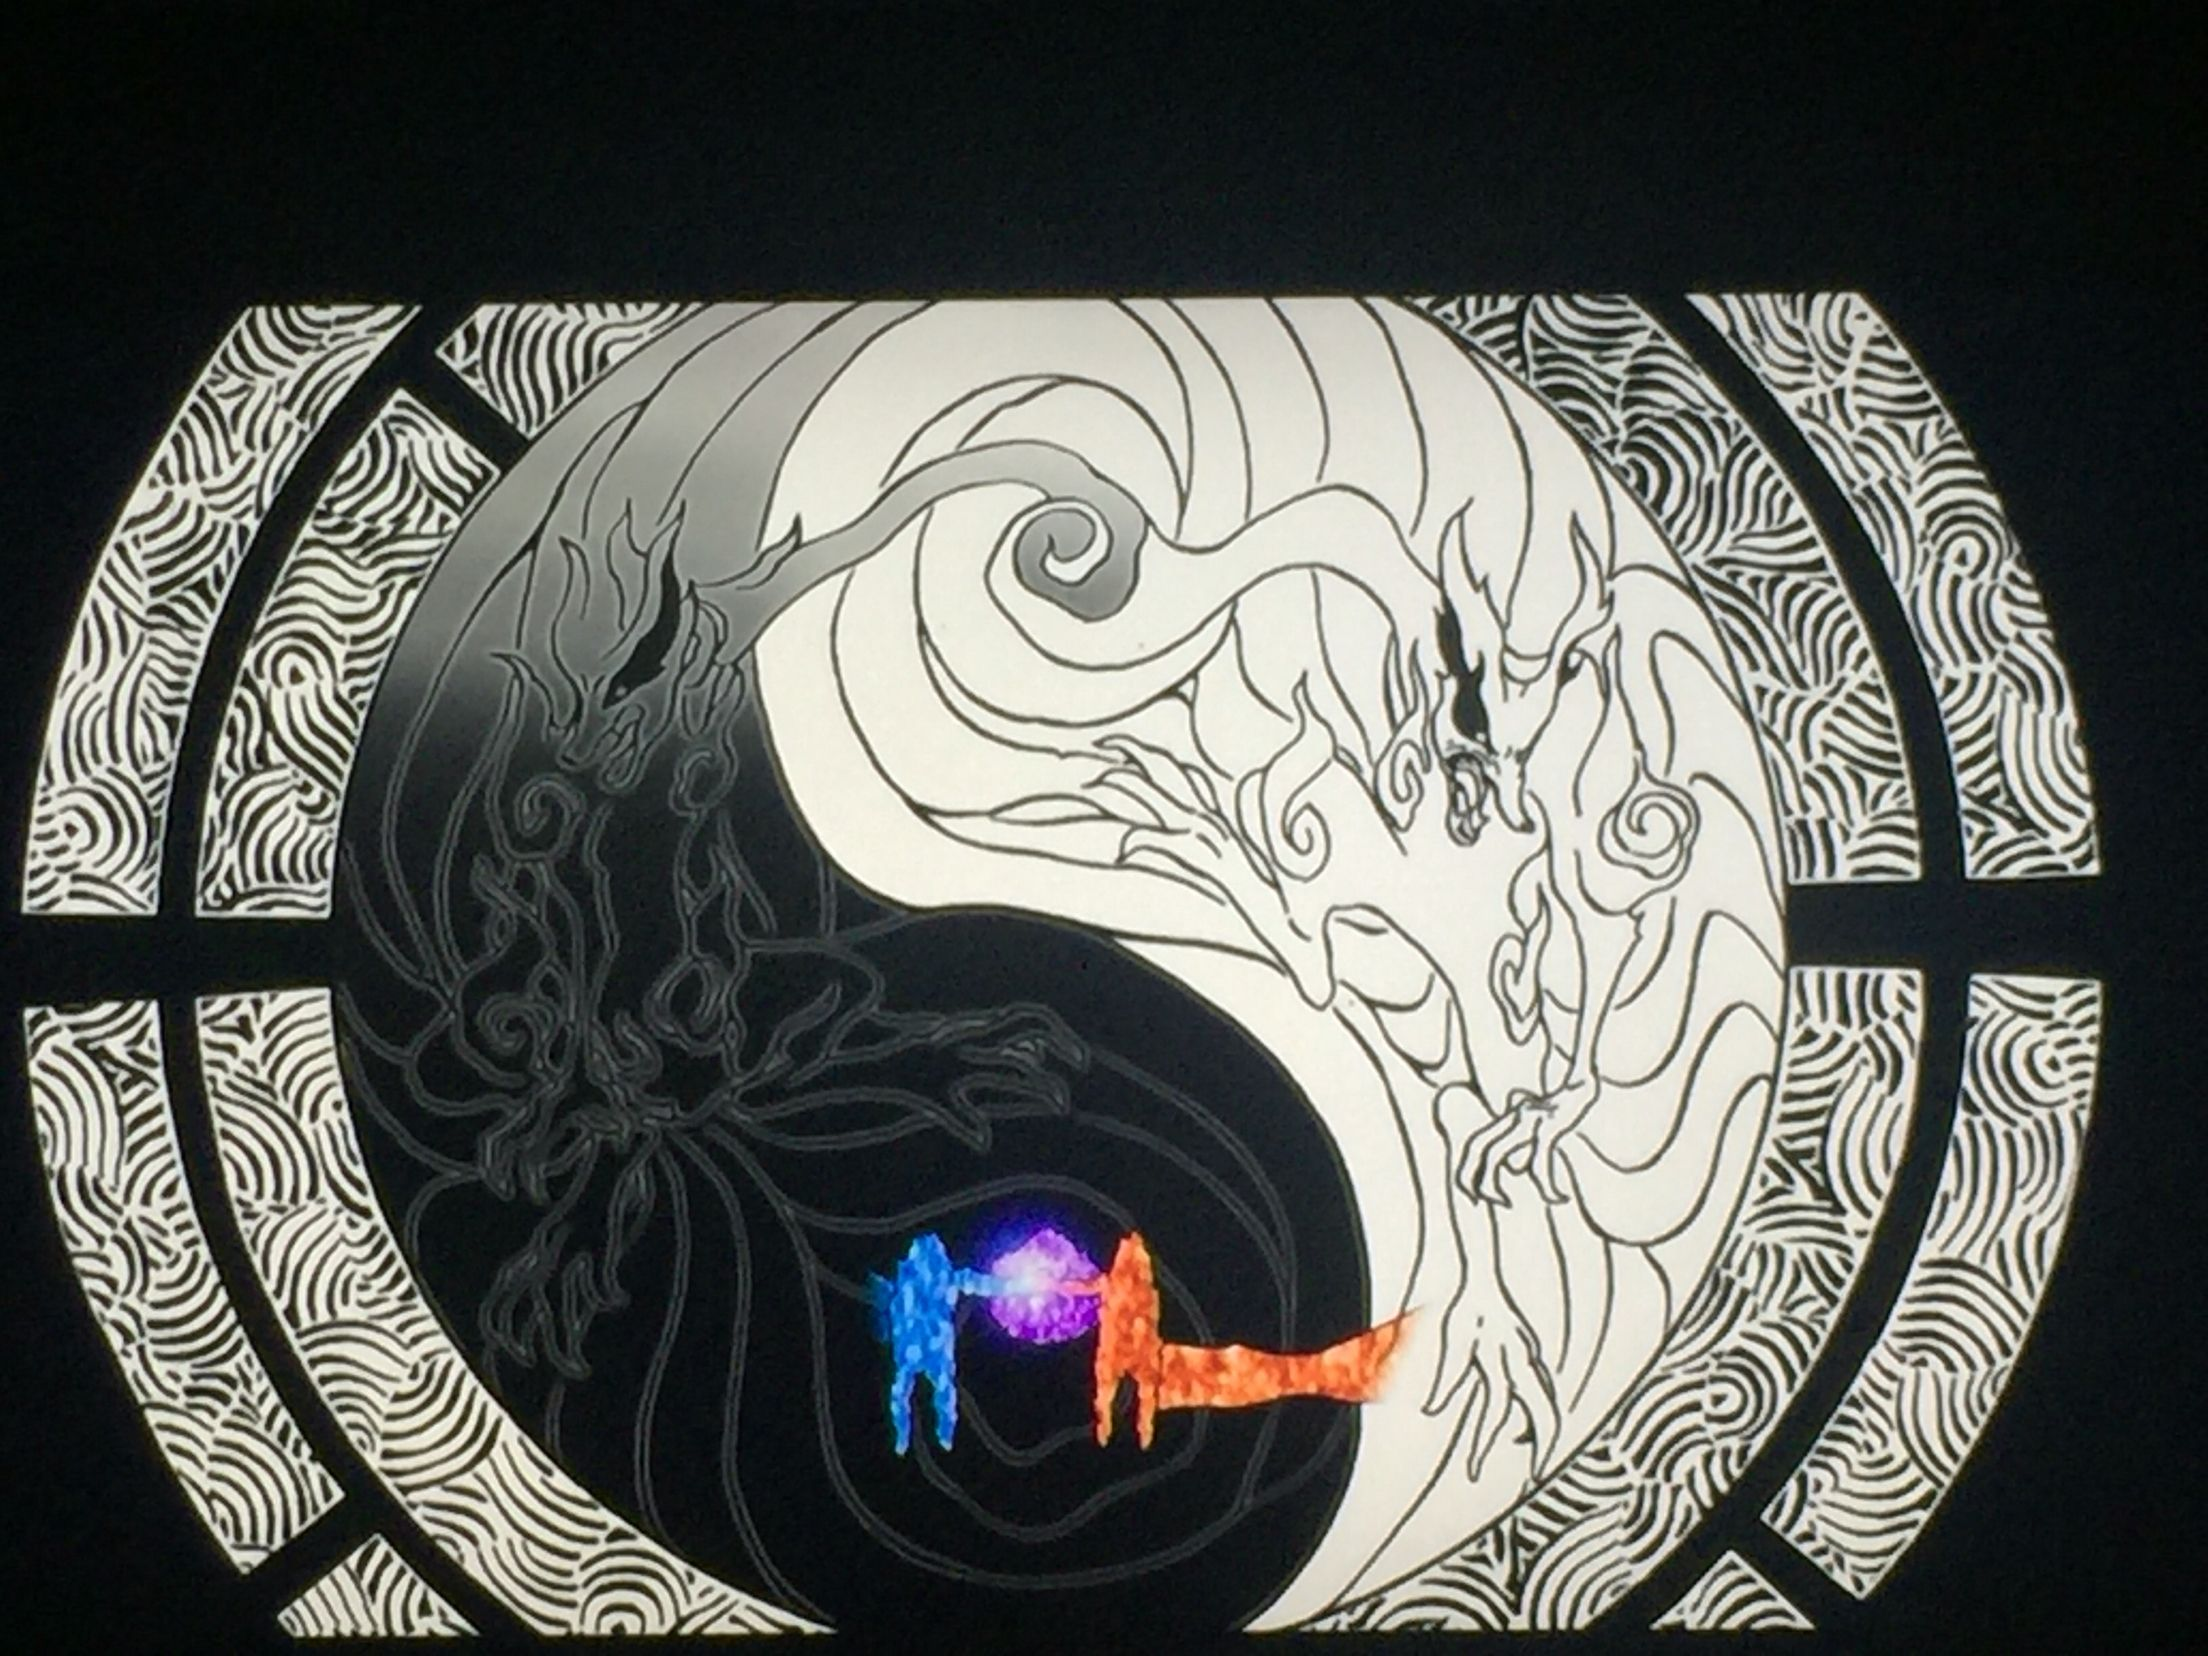 Naruto Kurama Yin & Yang Tat?